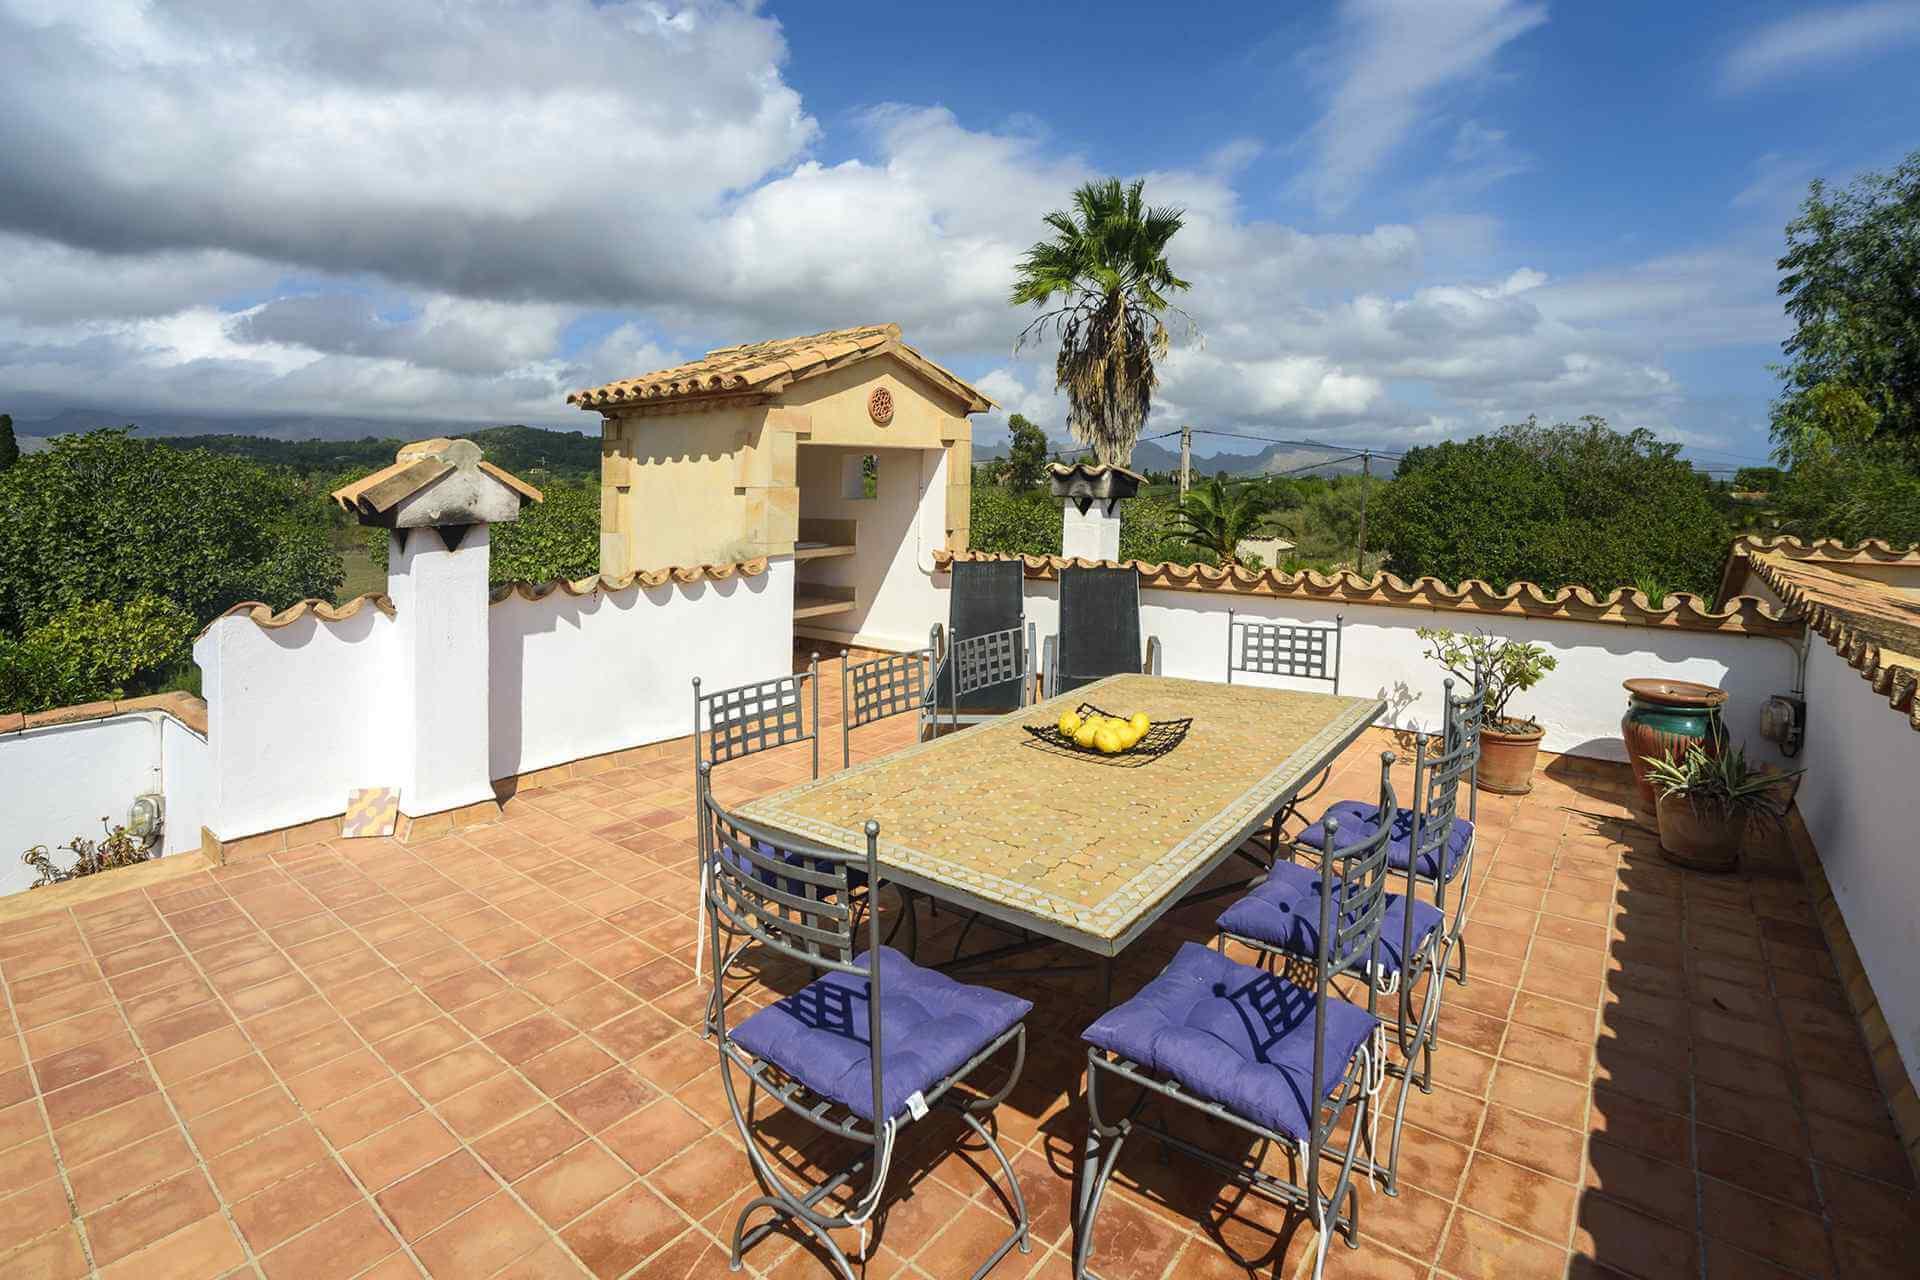 01-161 Finca mit hübschem Garten Mallorca Norden Bild 17